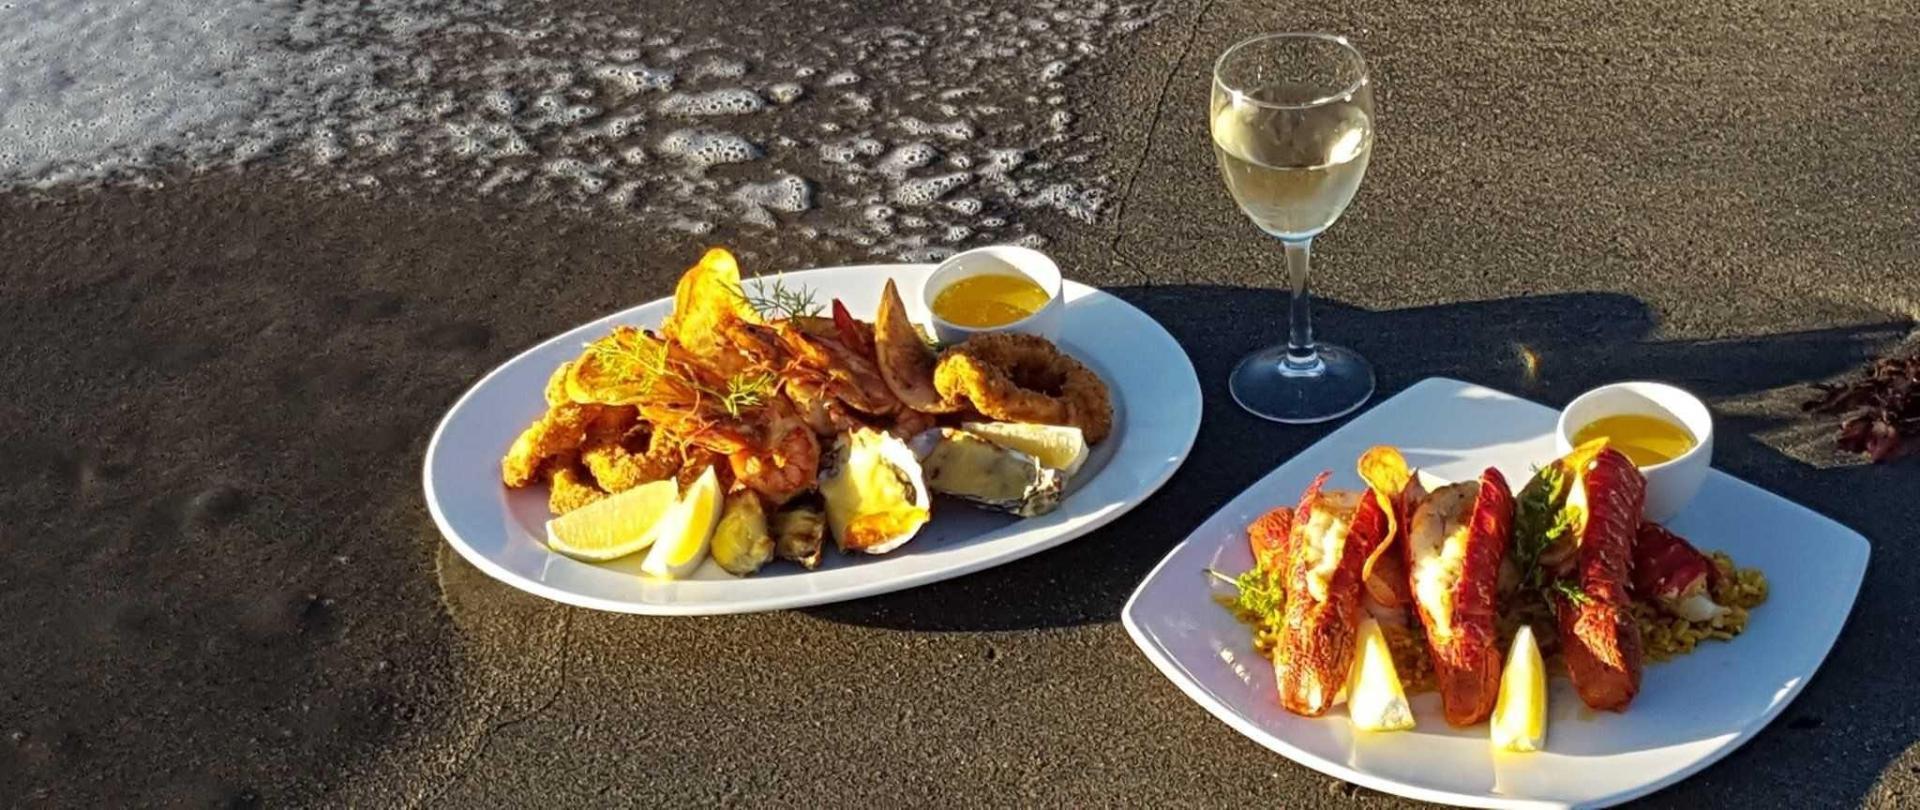 lobster-platter-beach-1.jpg